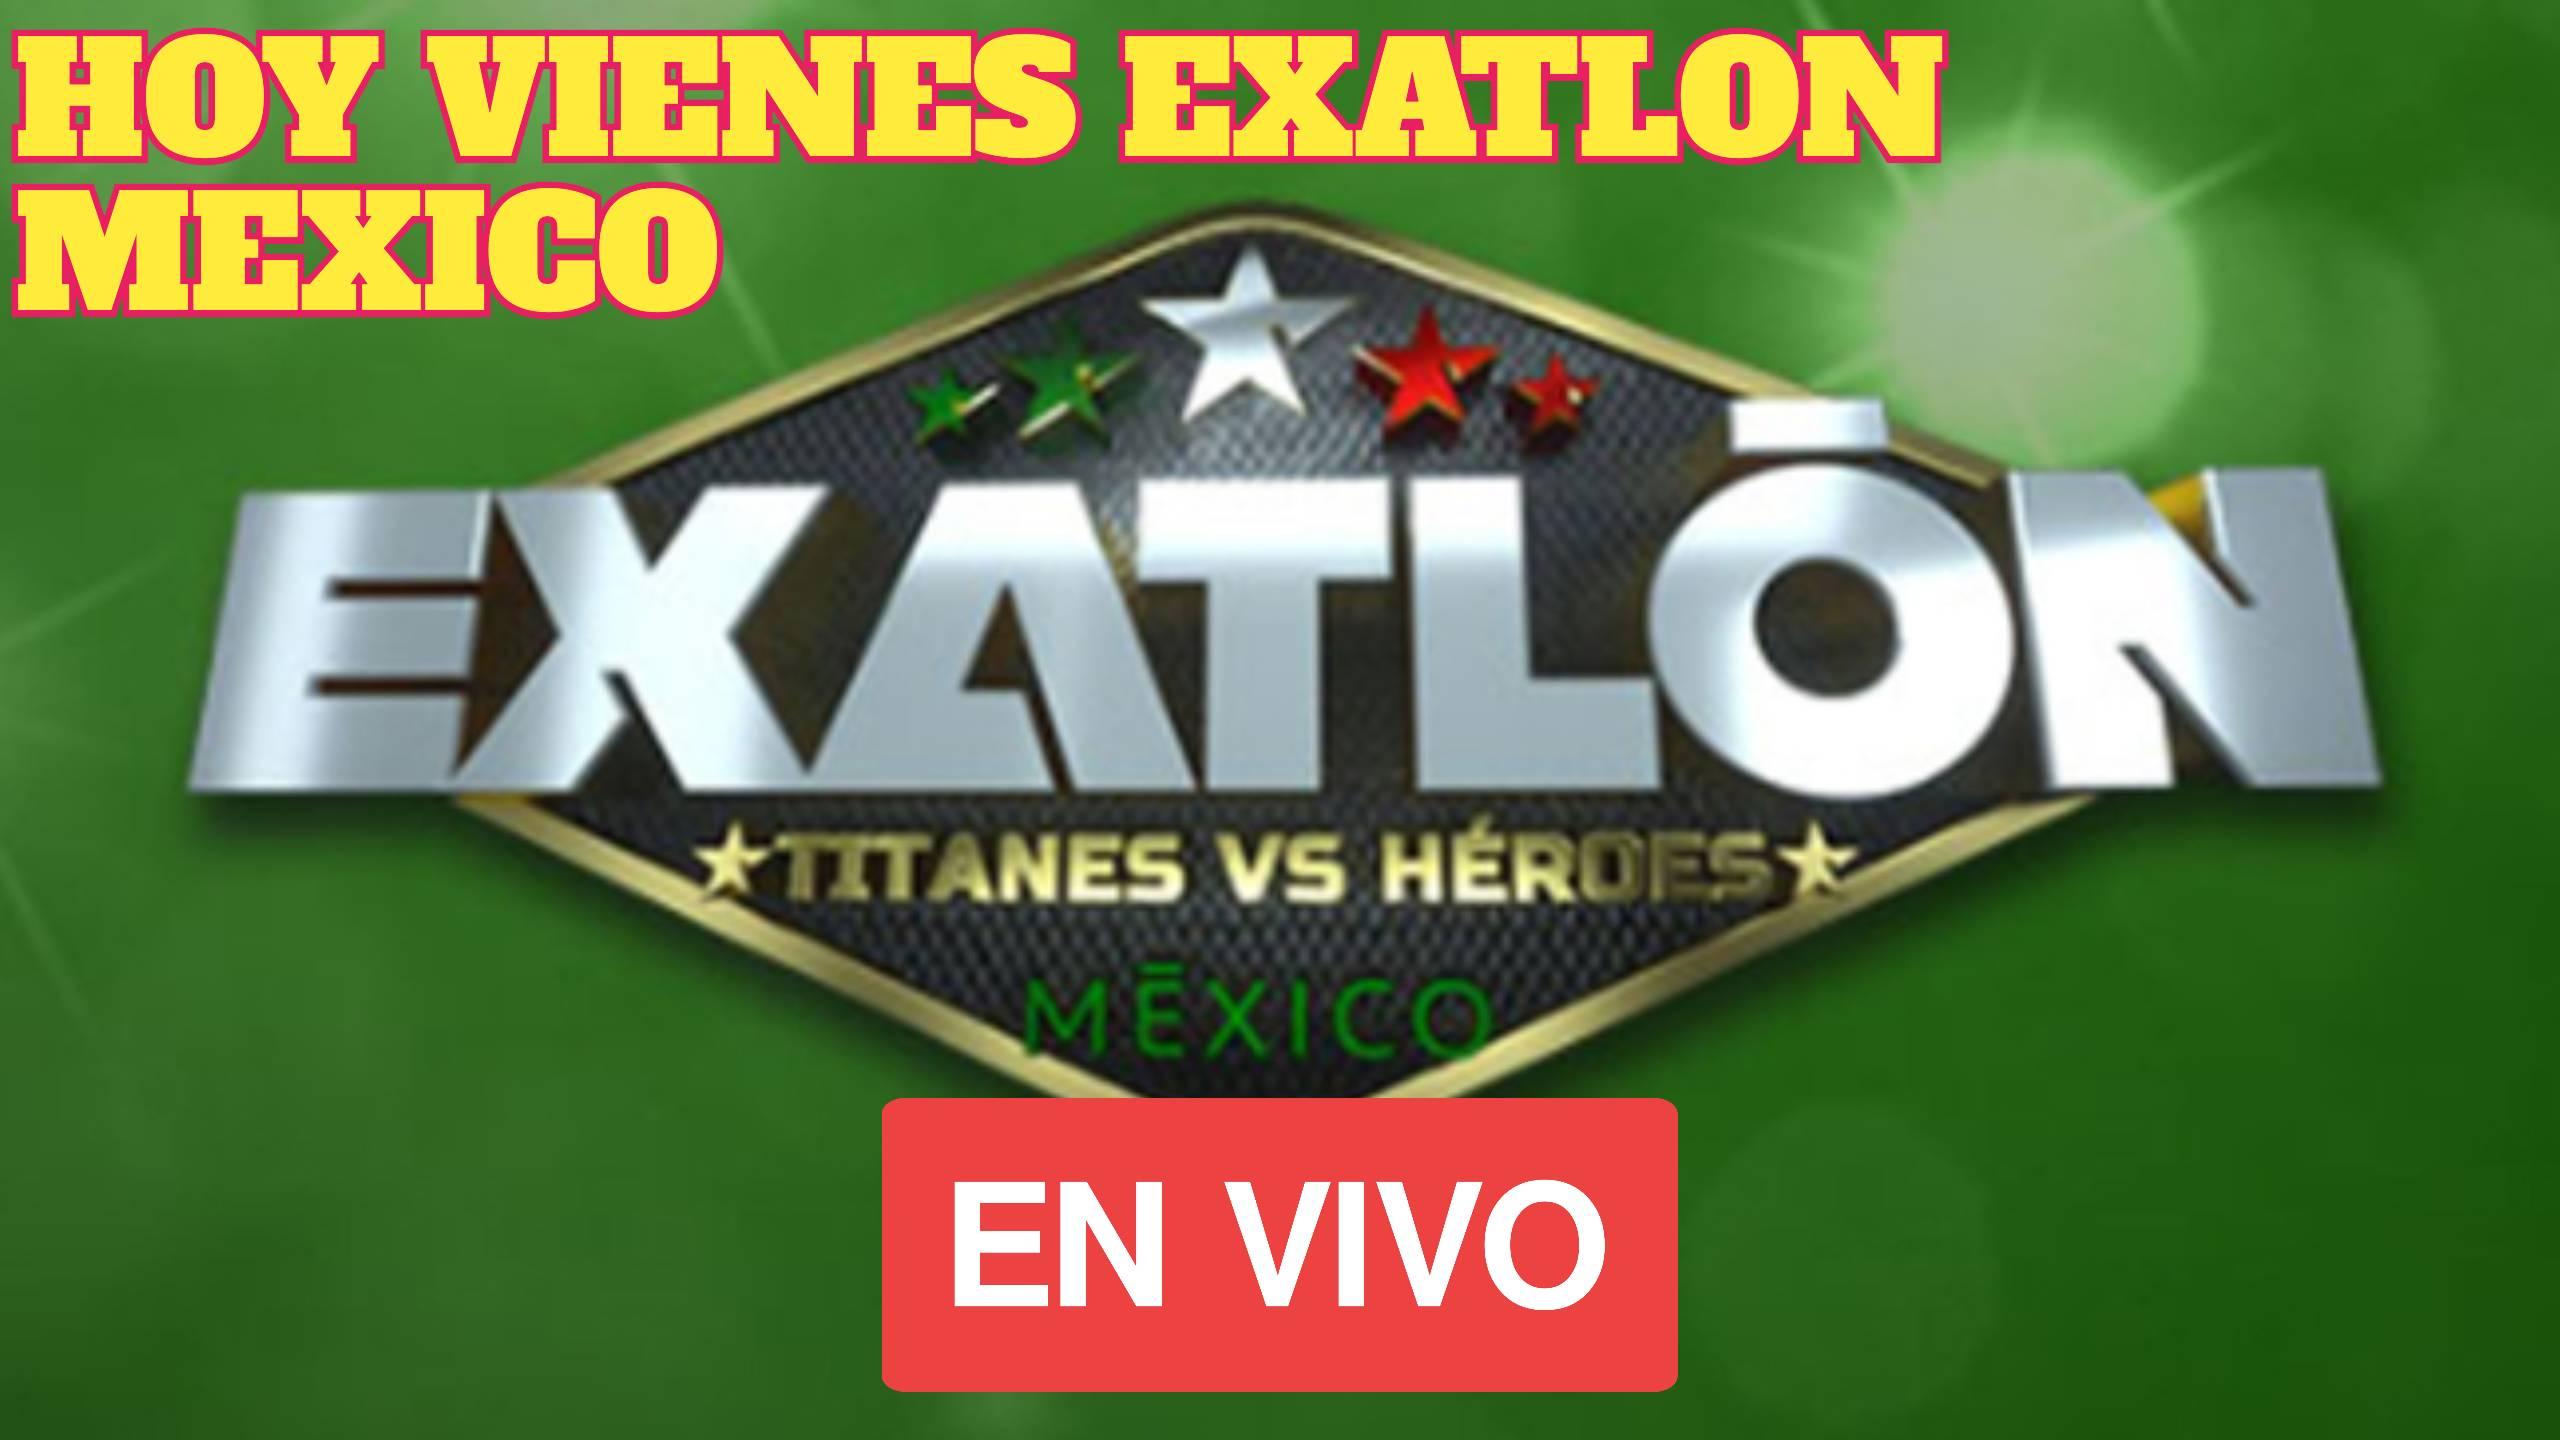 Hoy Viernes EXATLON MEXICO 2021